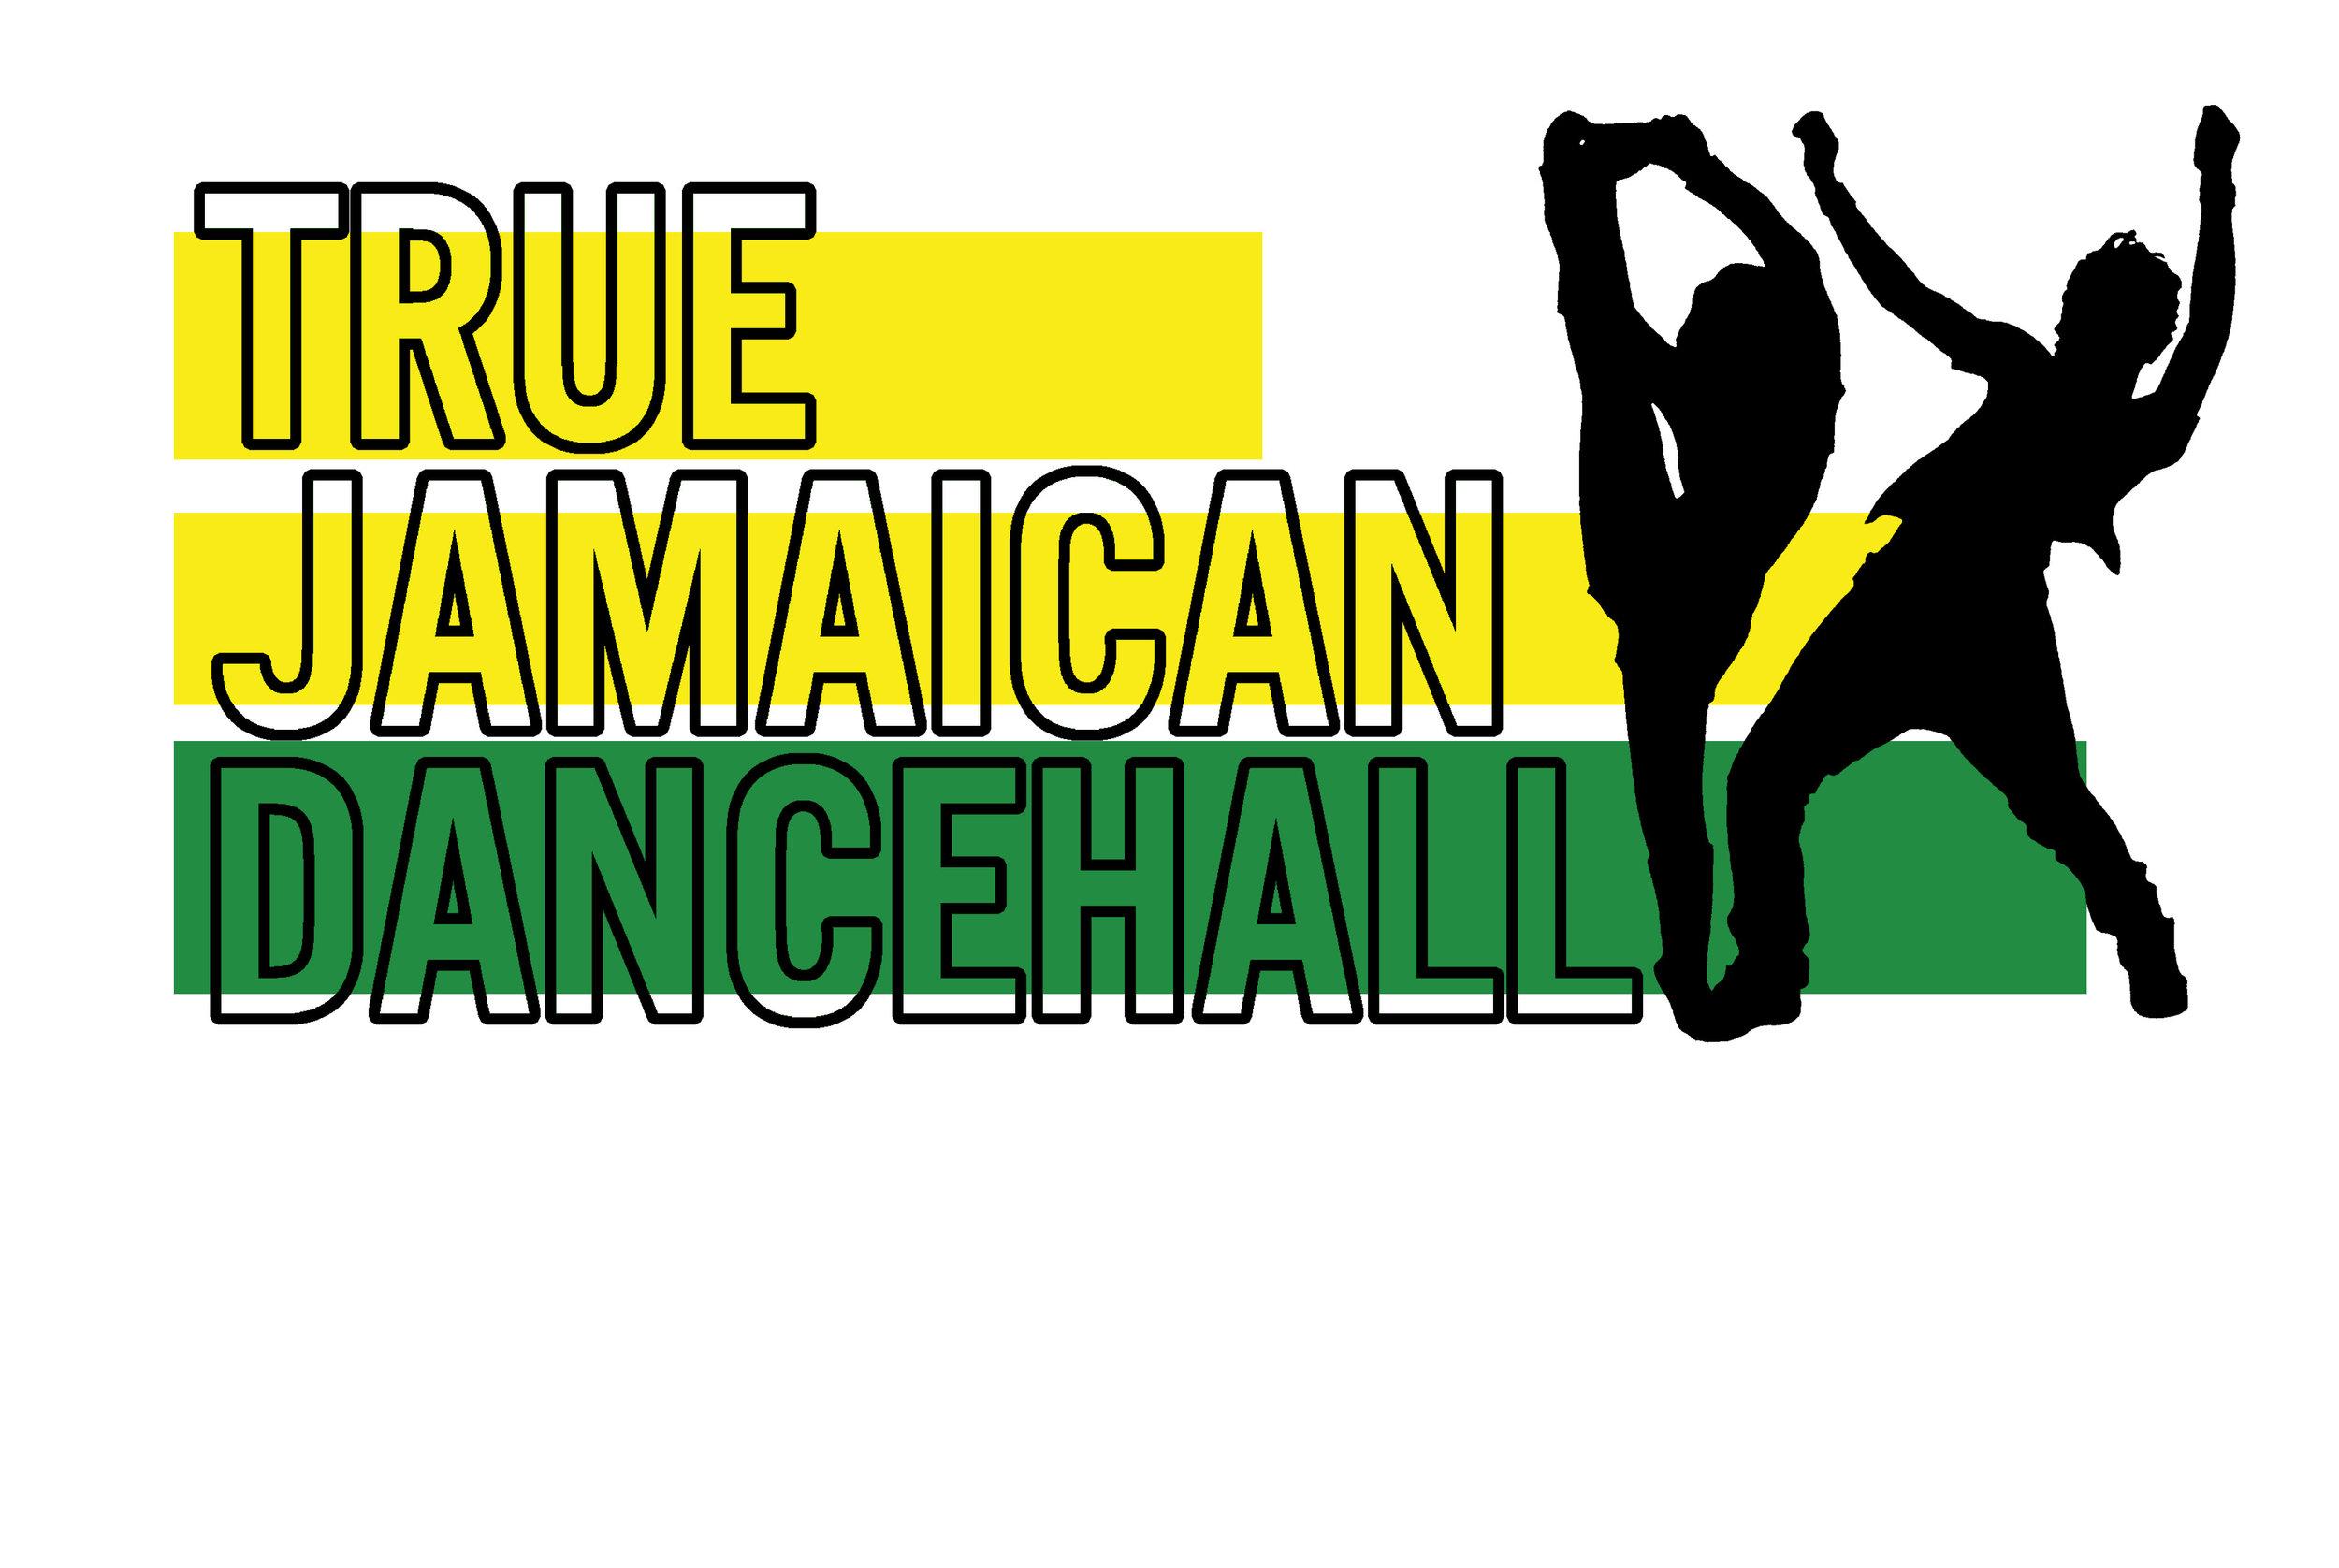 True Jamaican Dancehall Logo